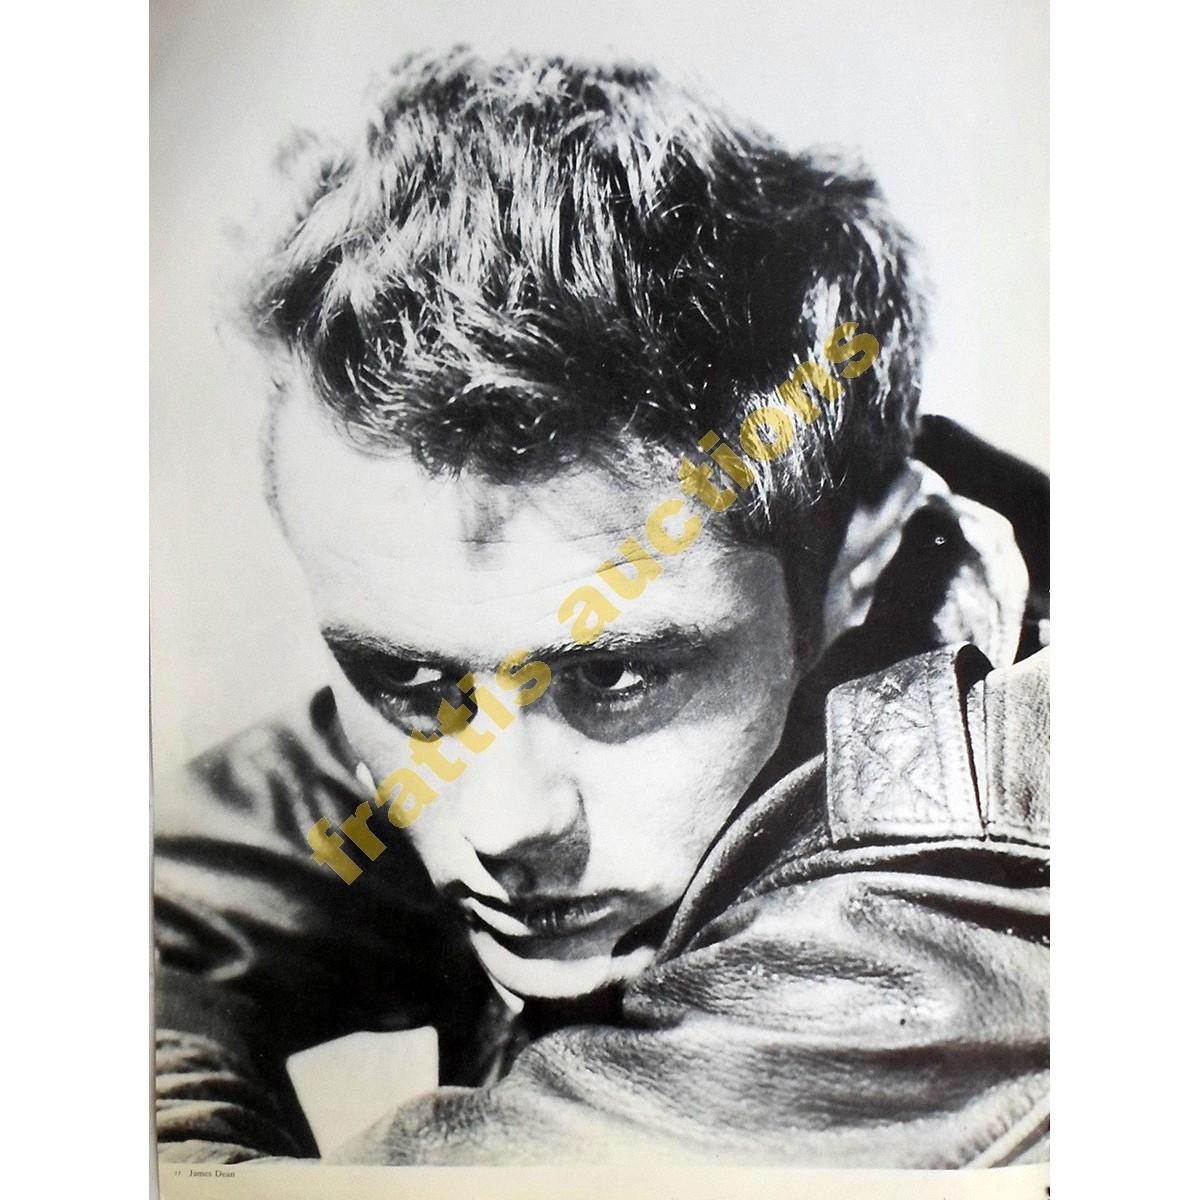 James Dean, poster.